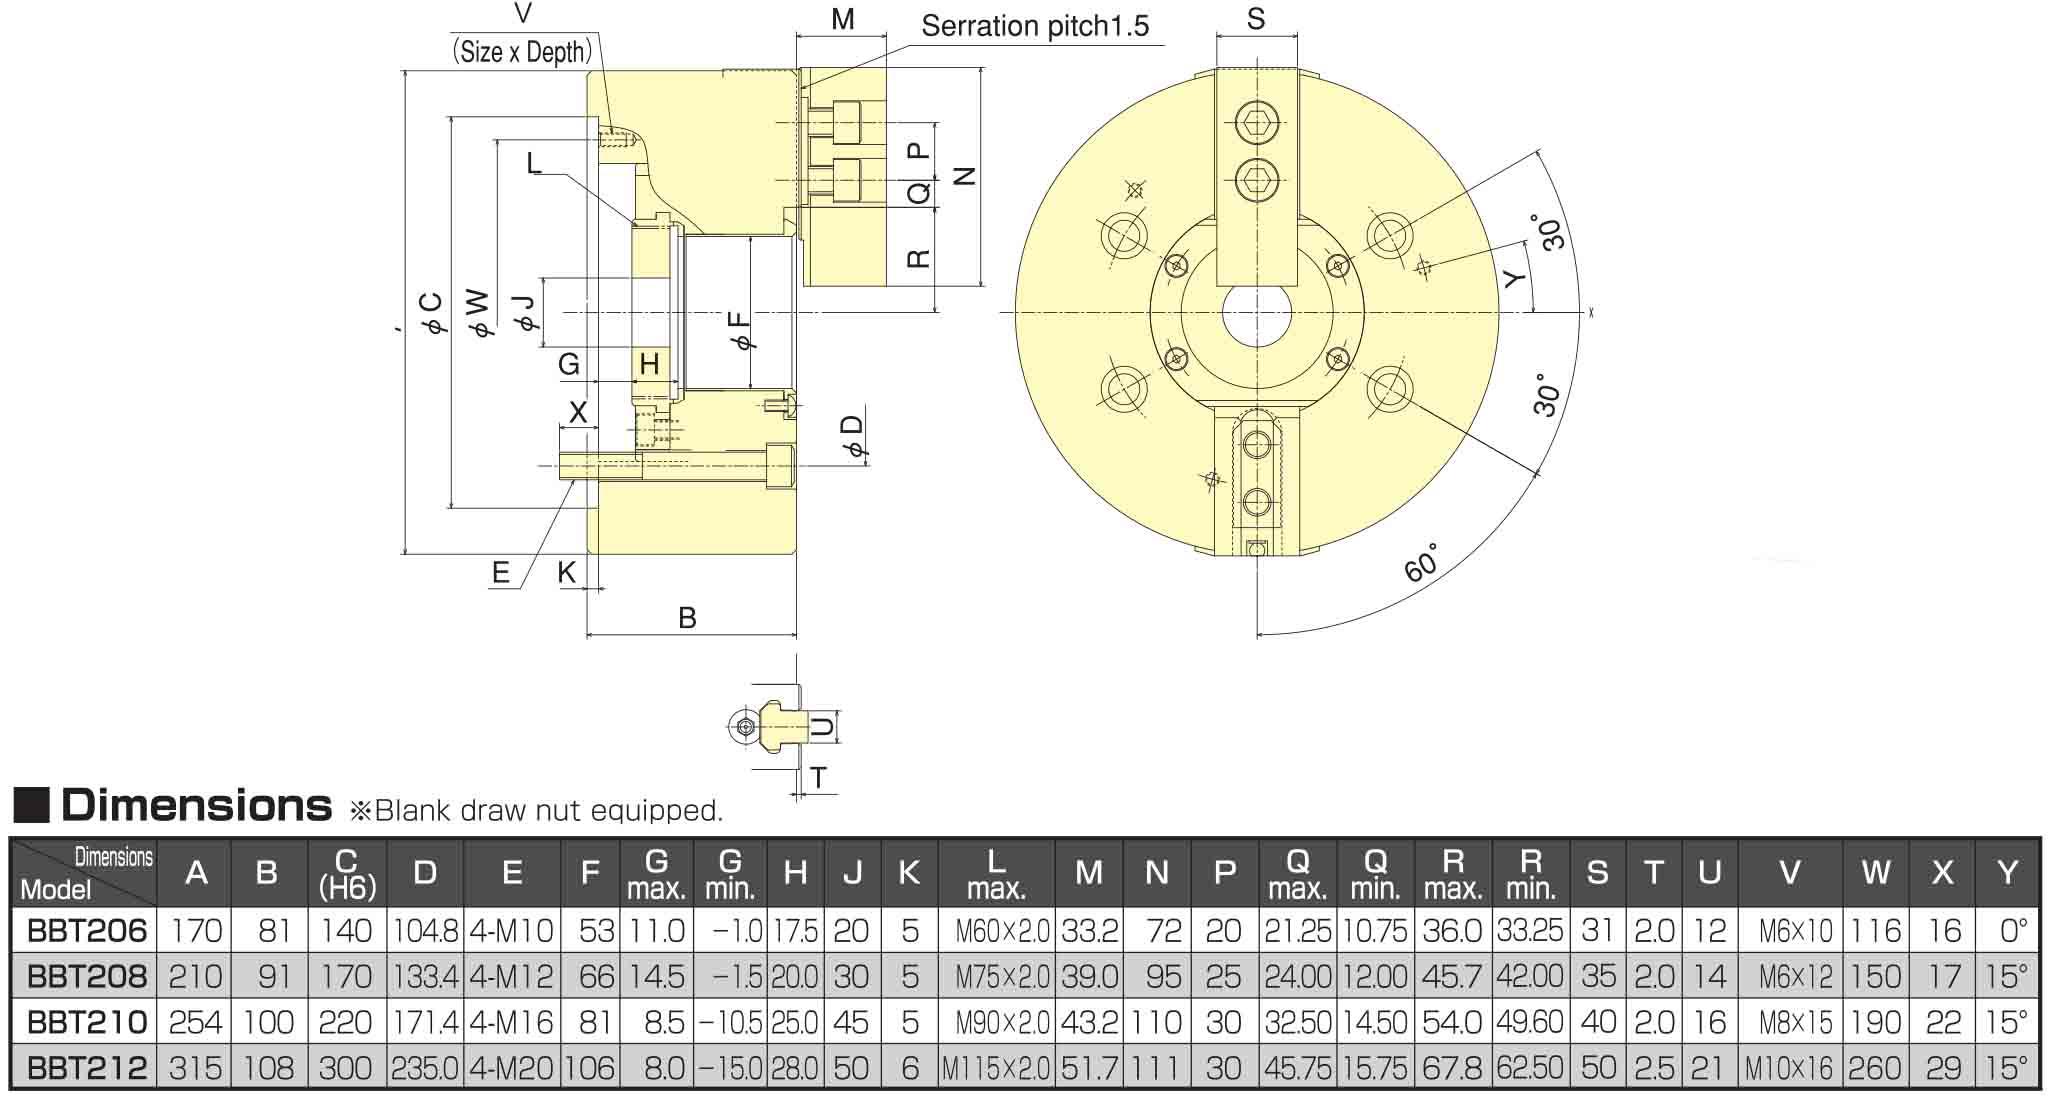 Kitagawa BBT 206 Large Thru-Hole 2-Jaw Power Chuck Dimensions